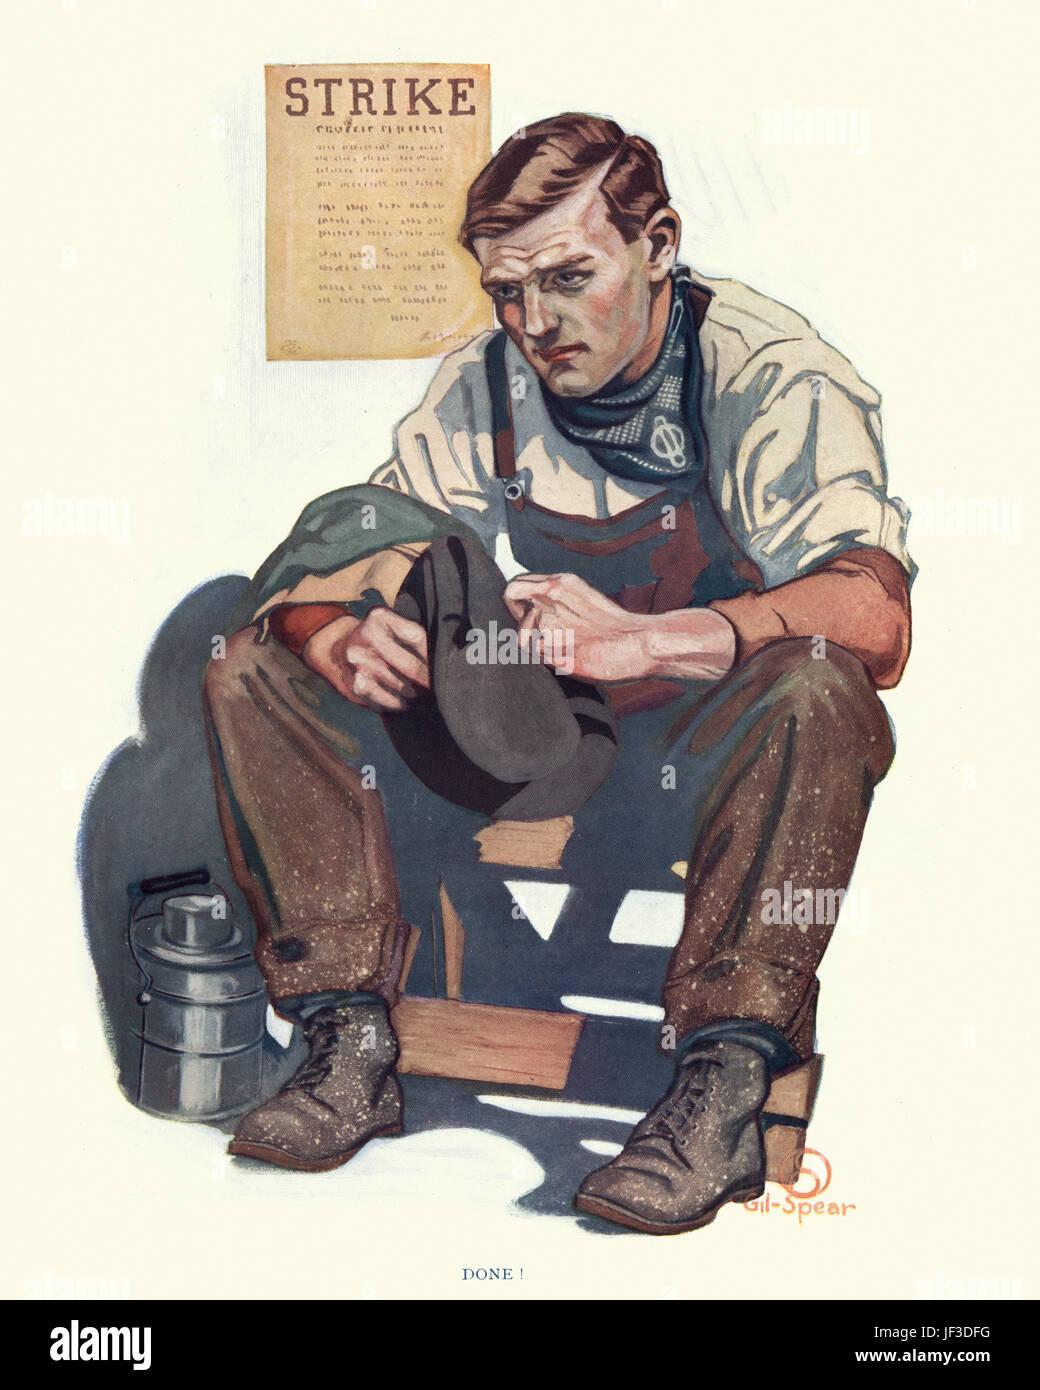 Worker on Strike, c. 1913 - Stock Image